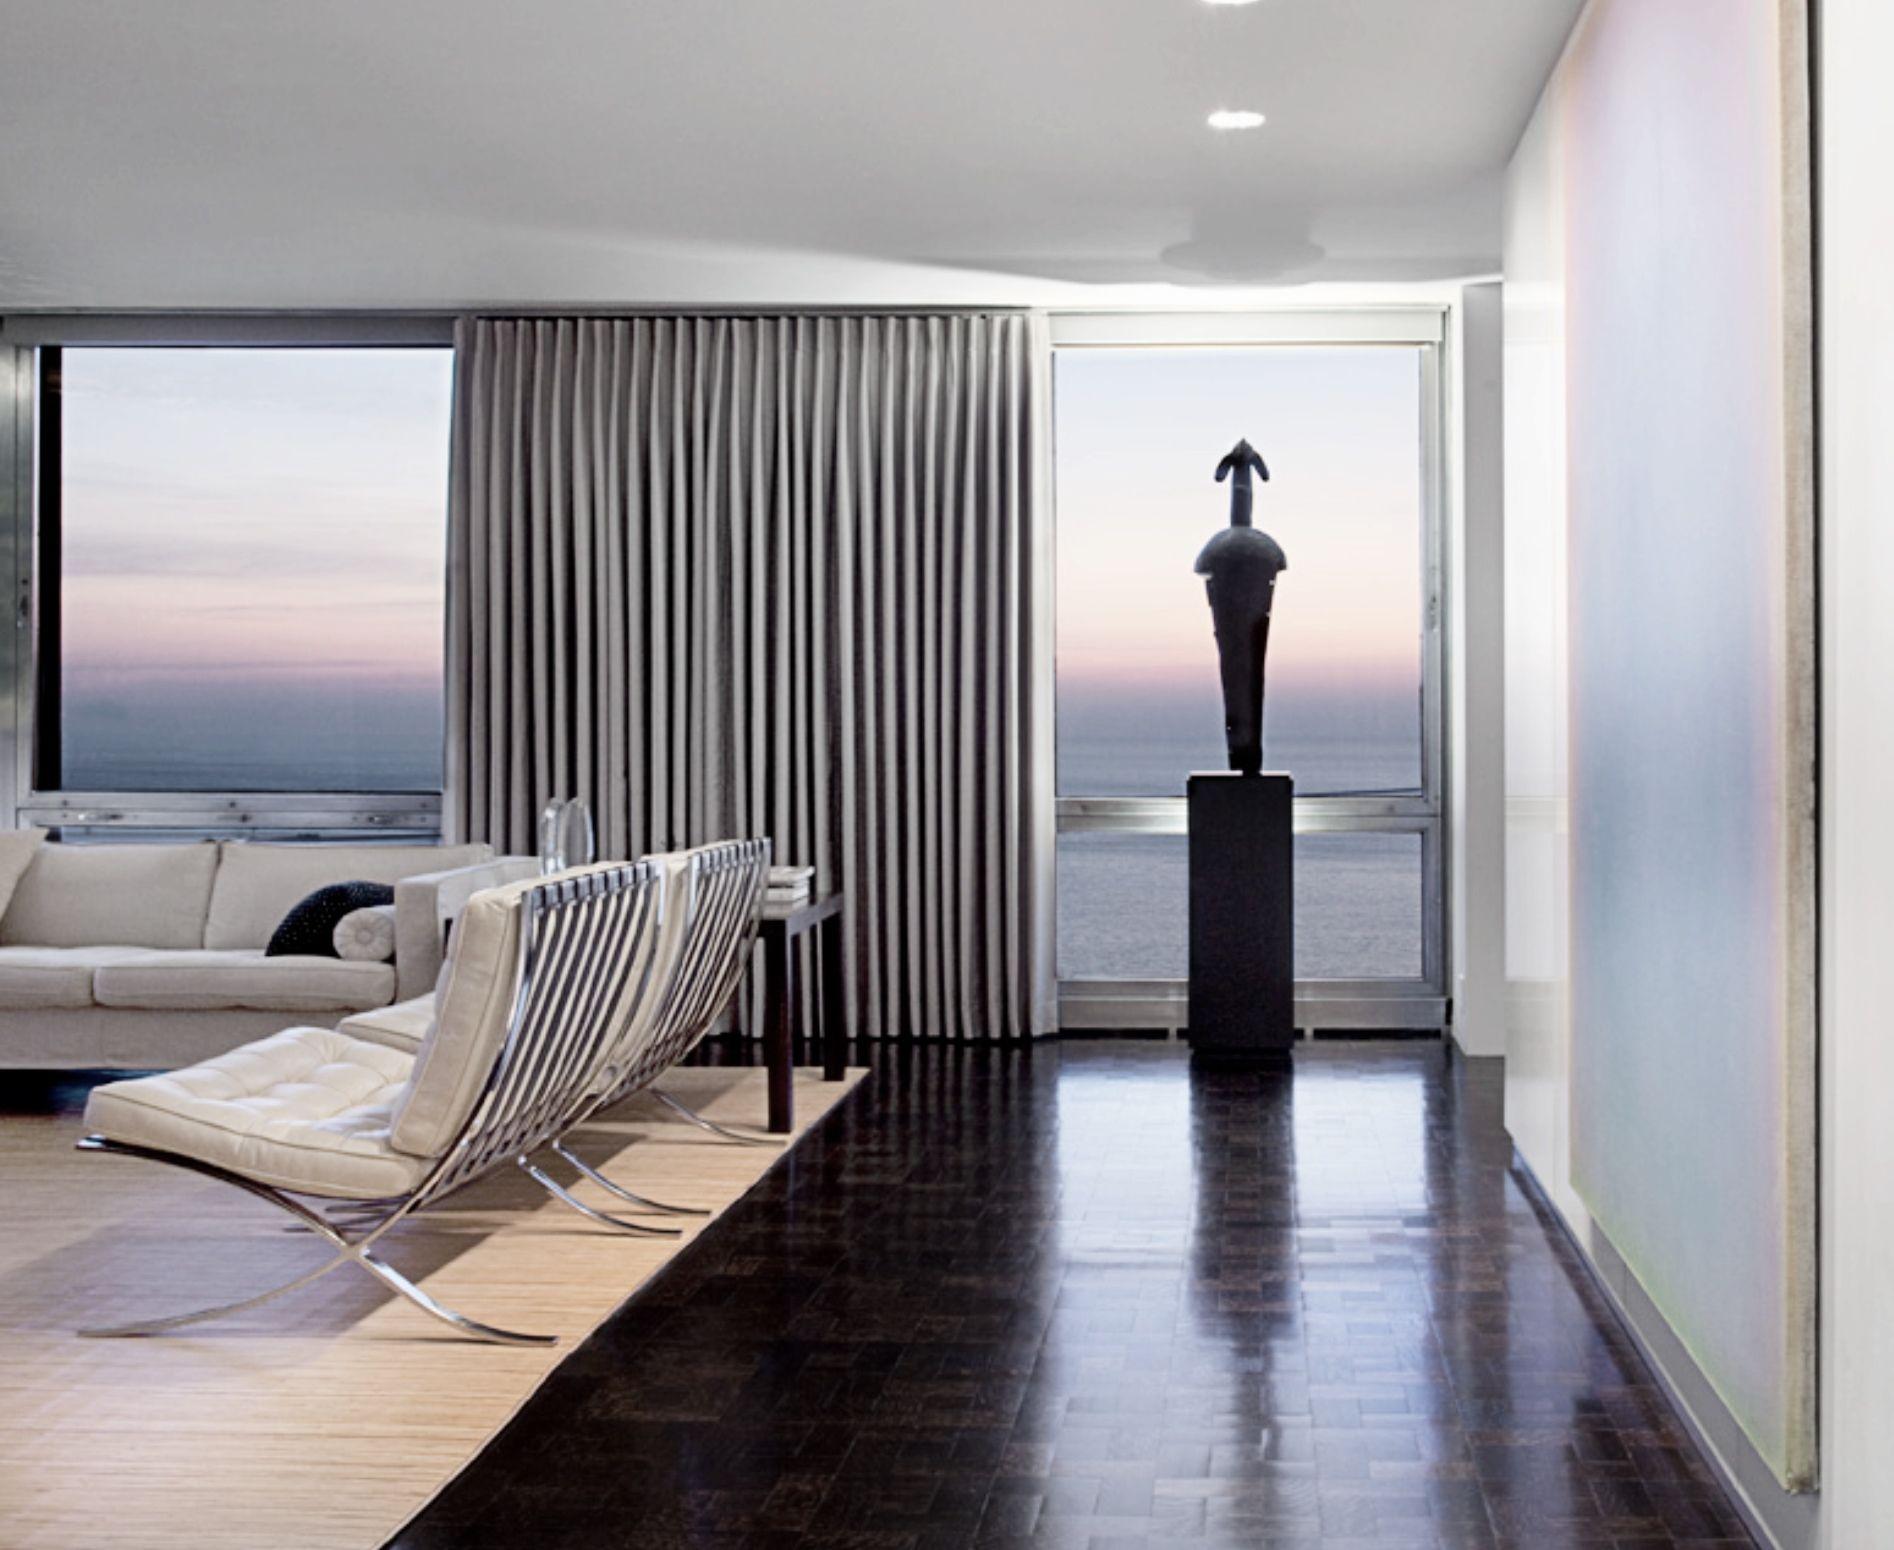 Designerlen Berlin 860 880 lake shore drive apartments chicago ludwig mies der